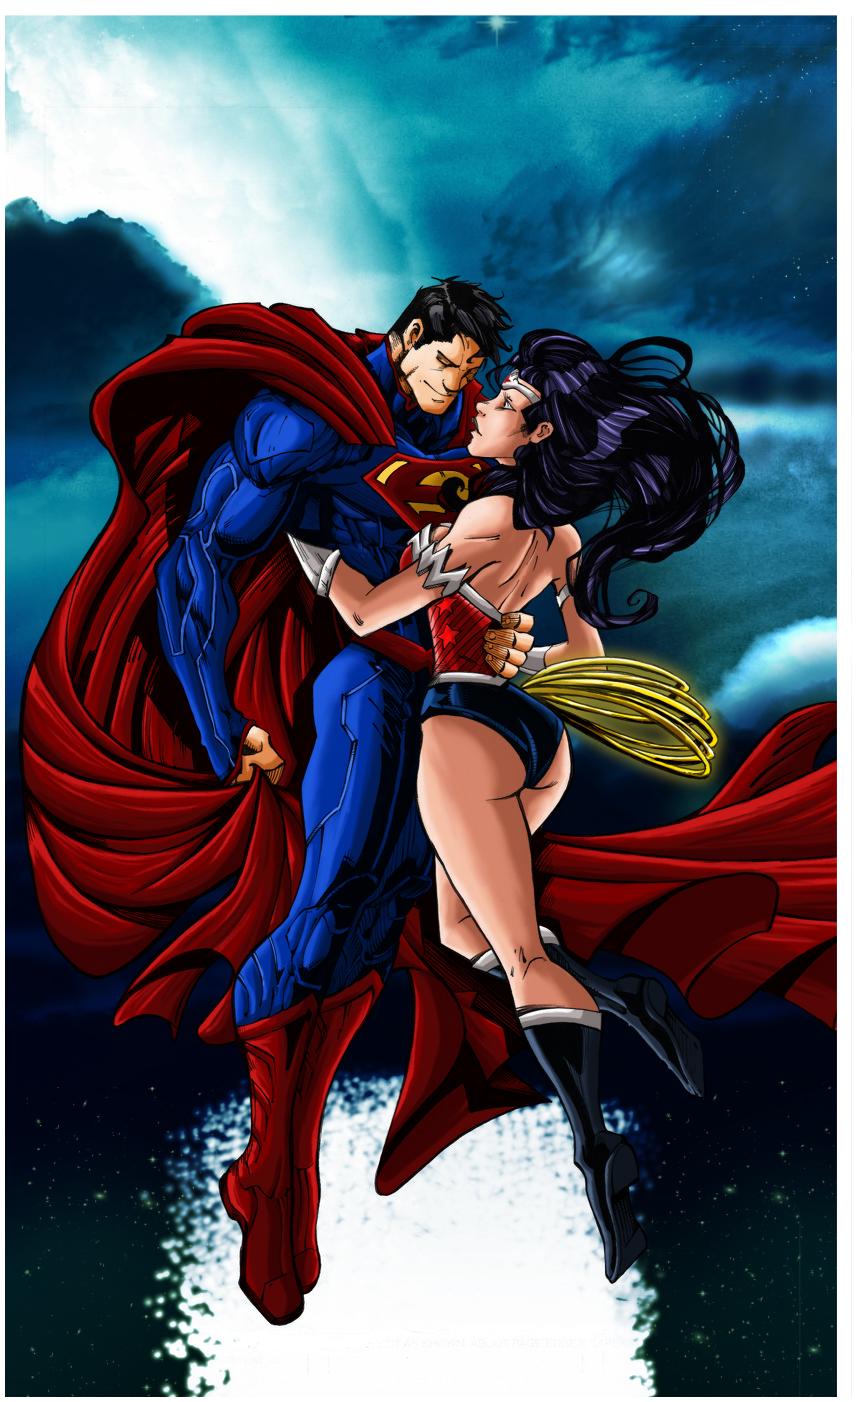 Superman and Wonderwoman by Leackim7891